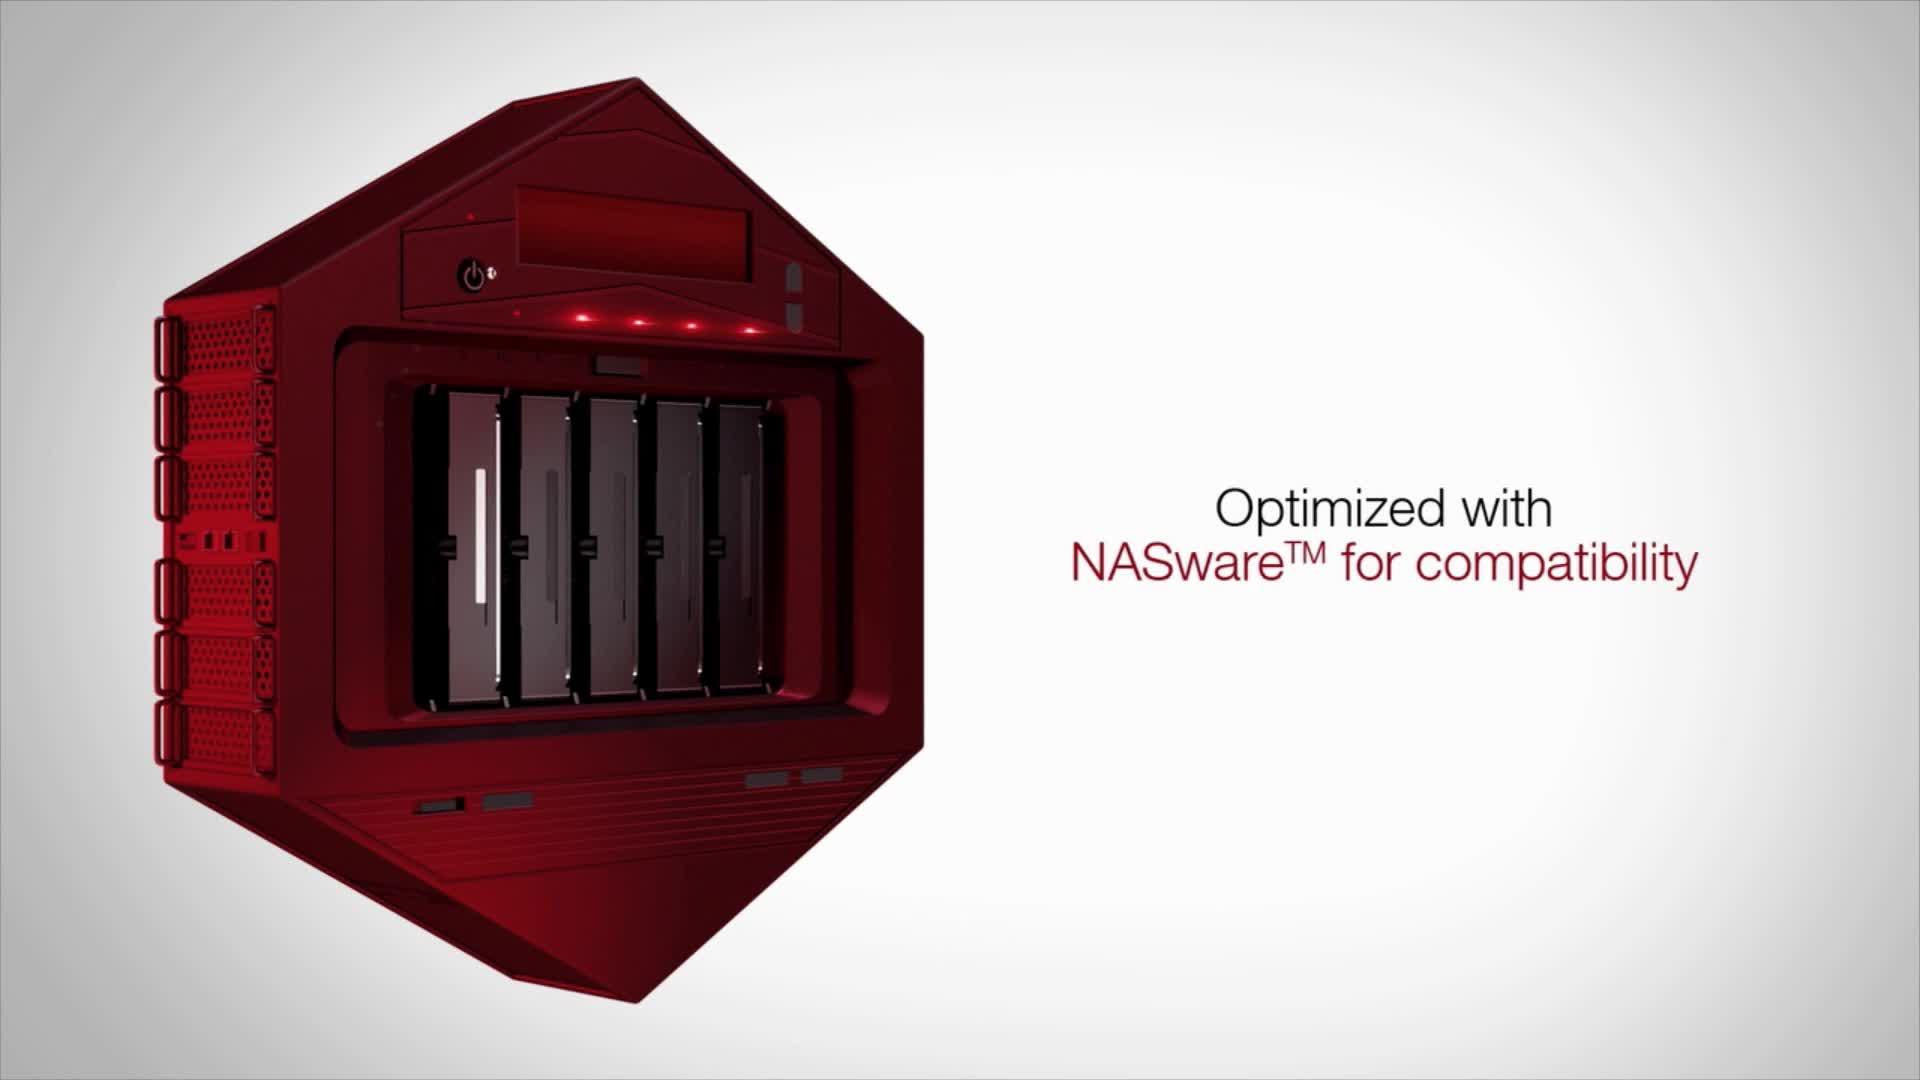 WD - Red 8TB 3.5 inch Intellipower 5400 RPM Internal Hard